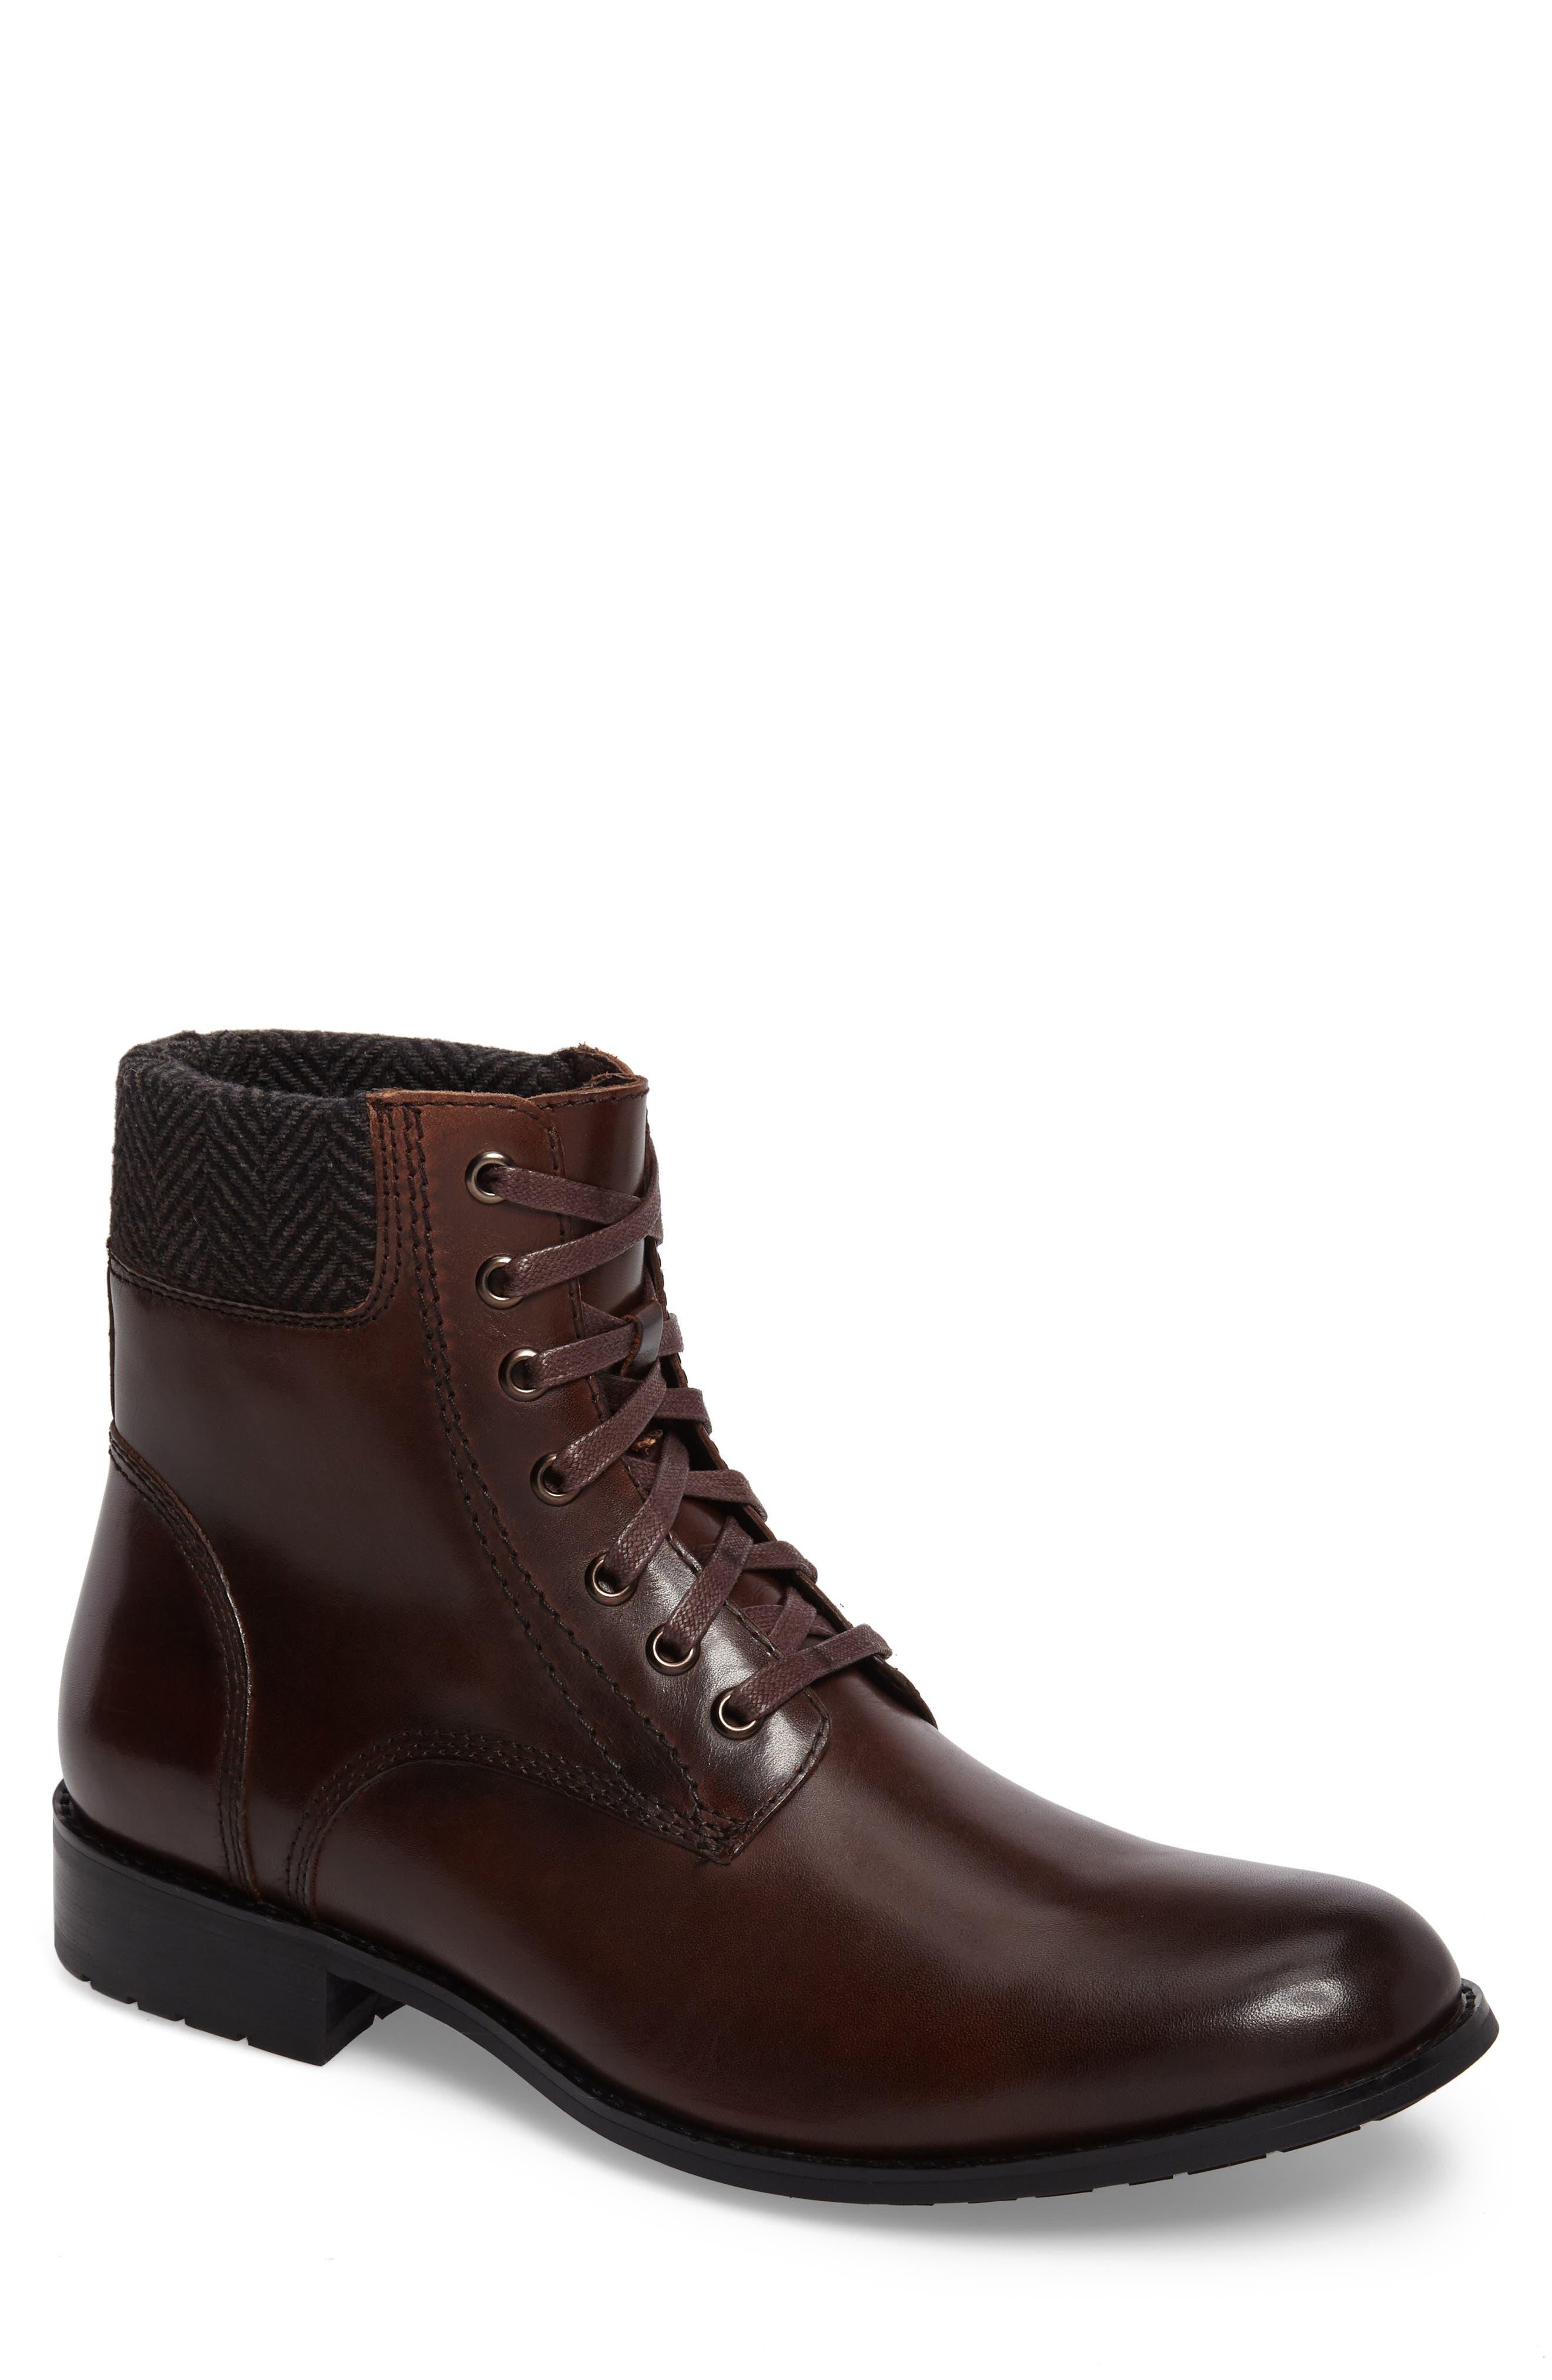 Saar Plain Toe Boot,                             Main thumbnail 2, color,